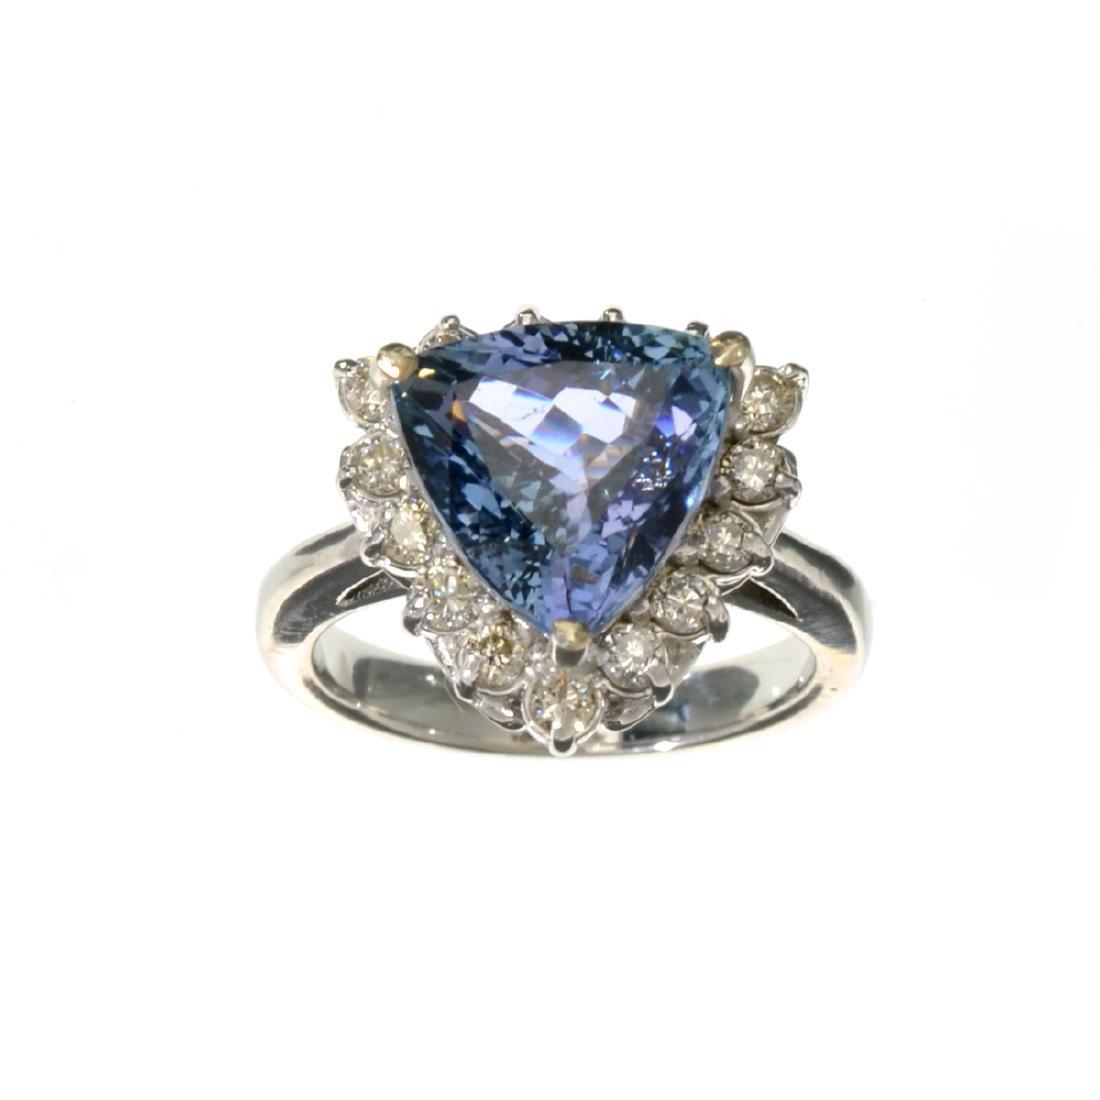 APP: 11.1k Fine Jewelry 14 KT White Gold, 5.15CT